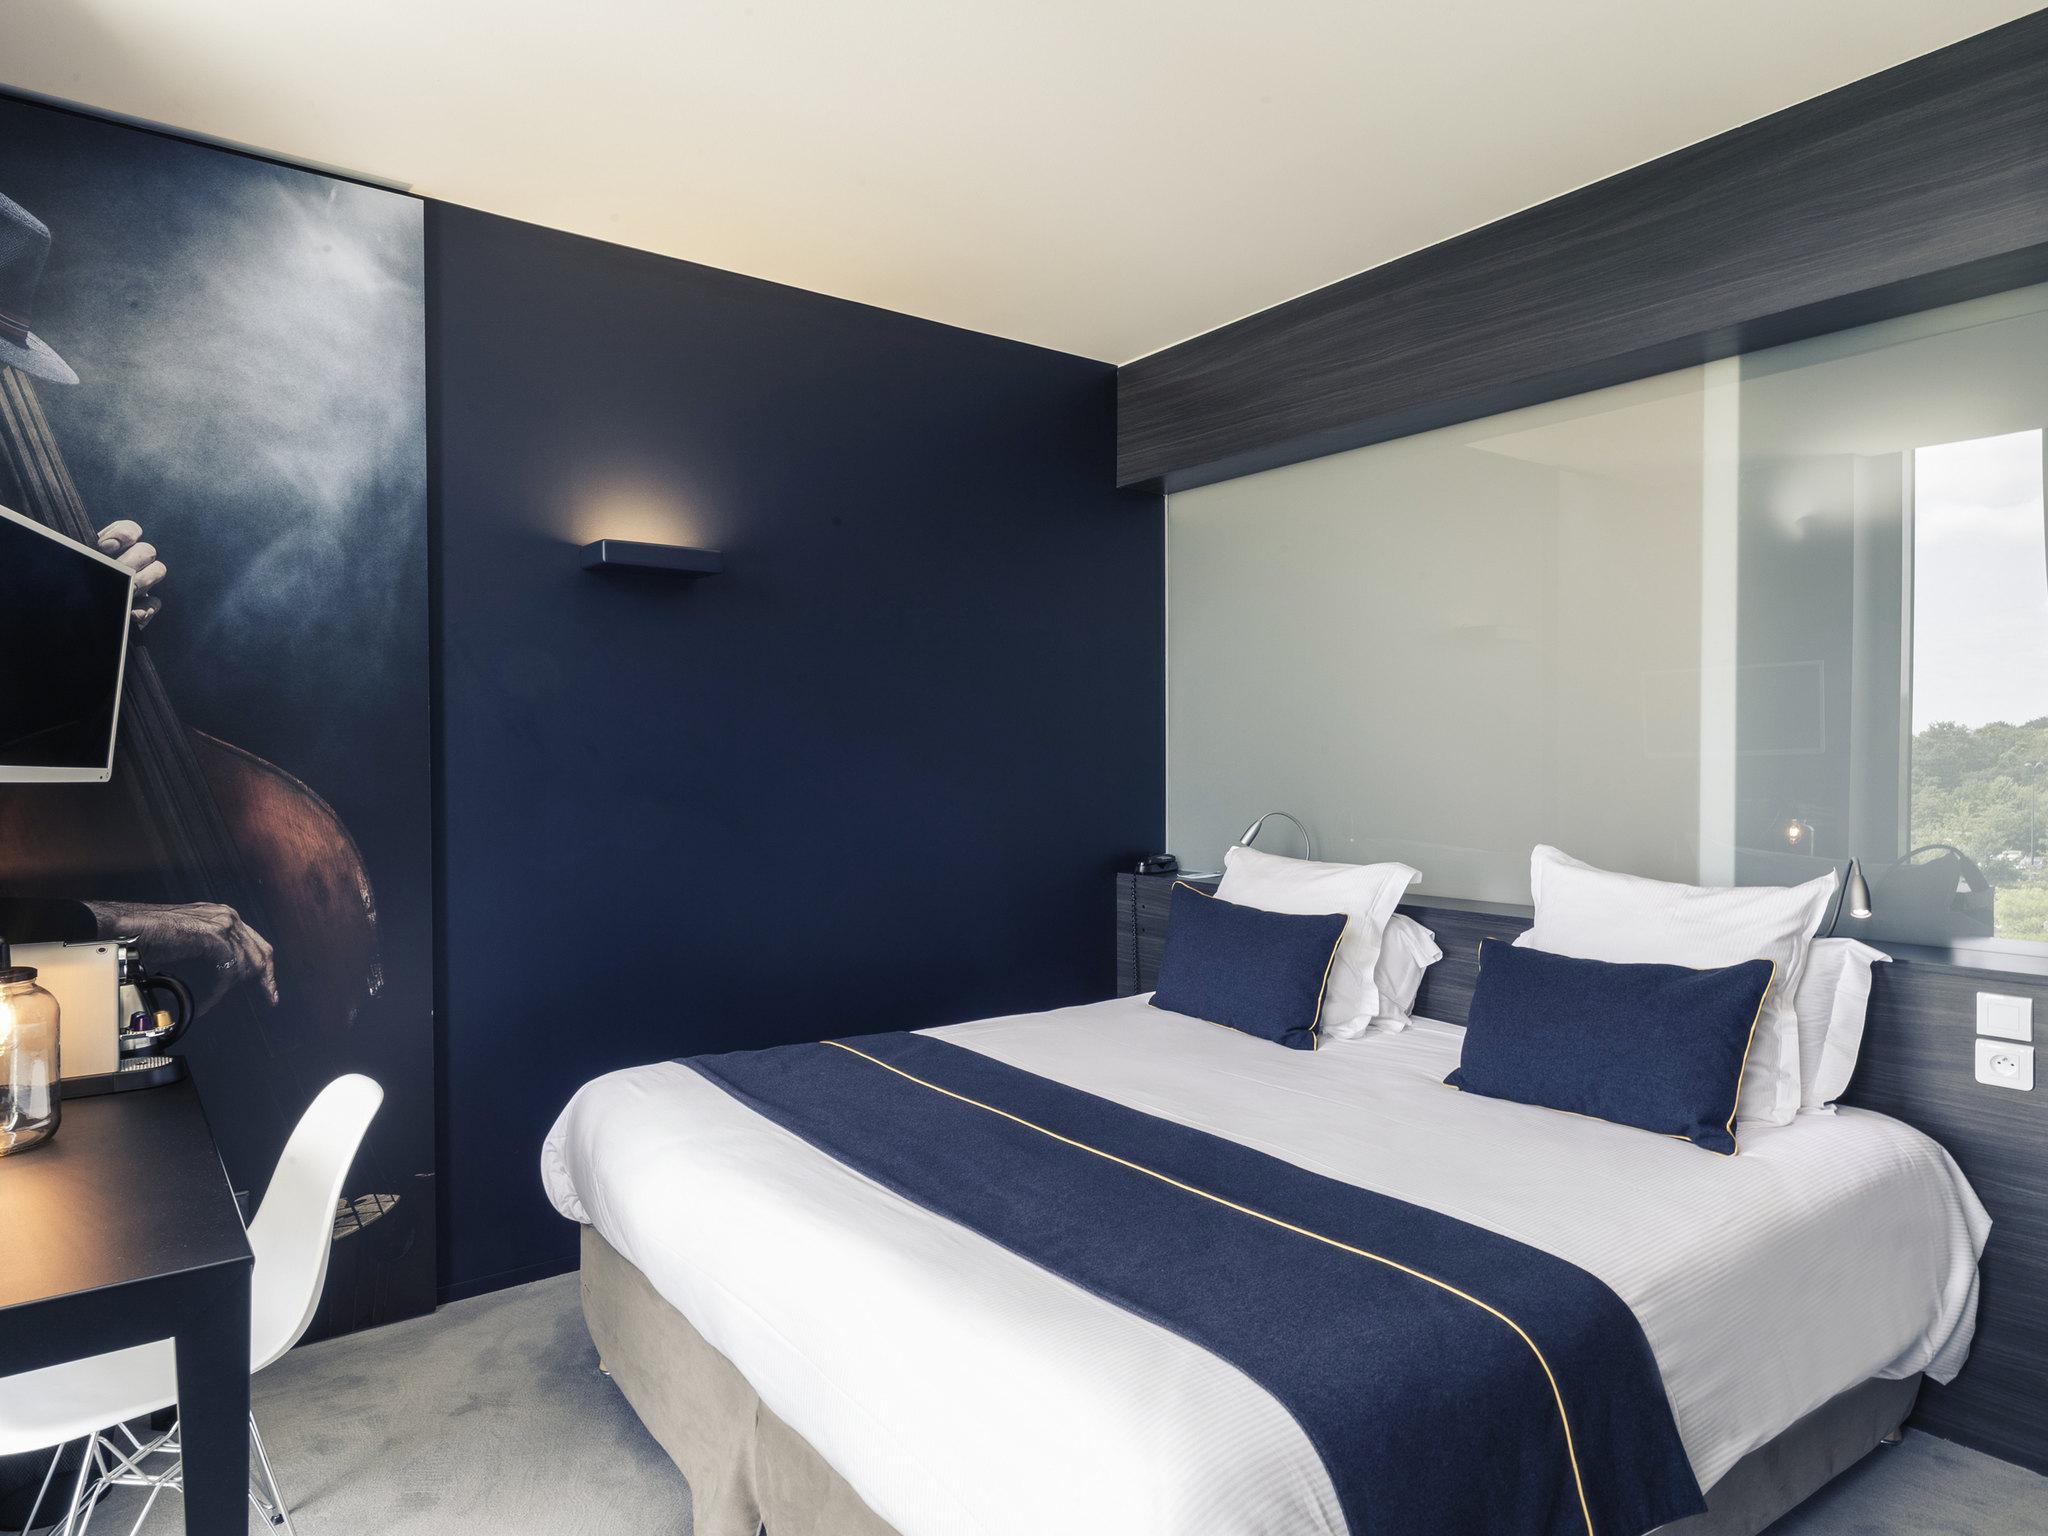 Hotel – Mercure Zénith Nantes Saint-Herblain Hotel